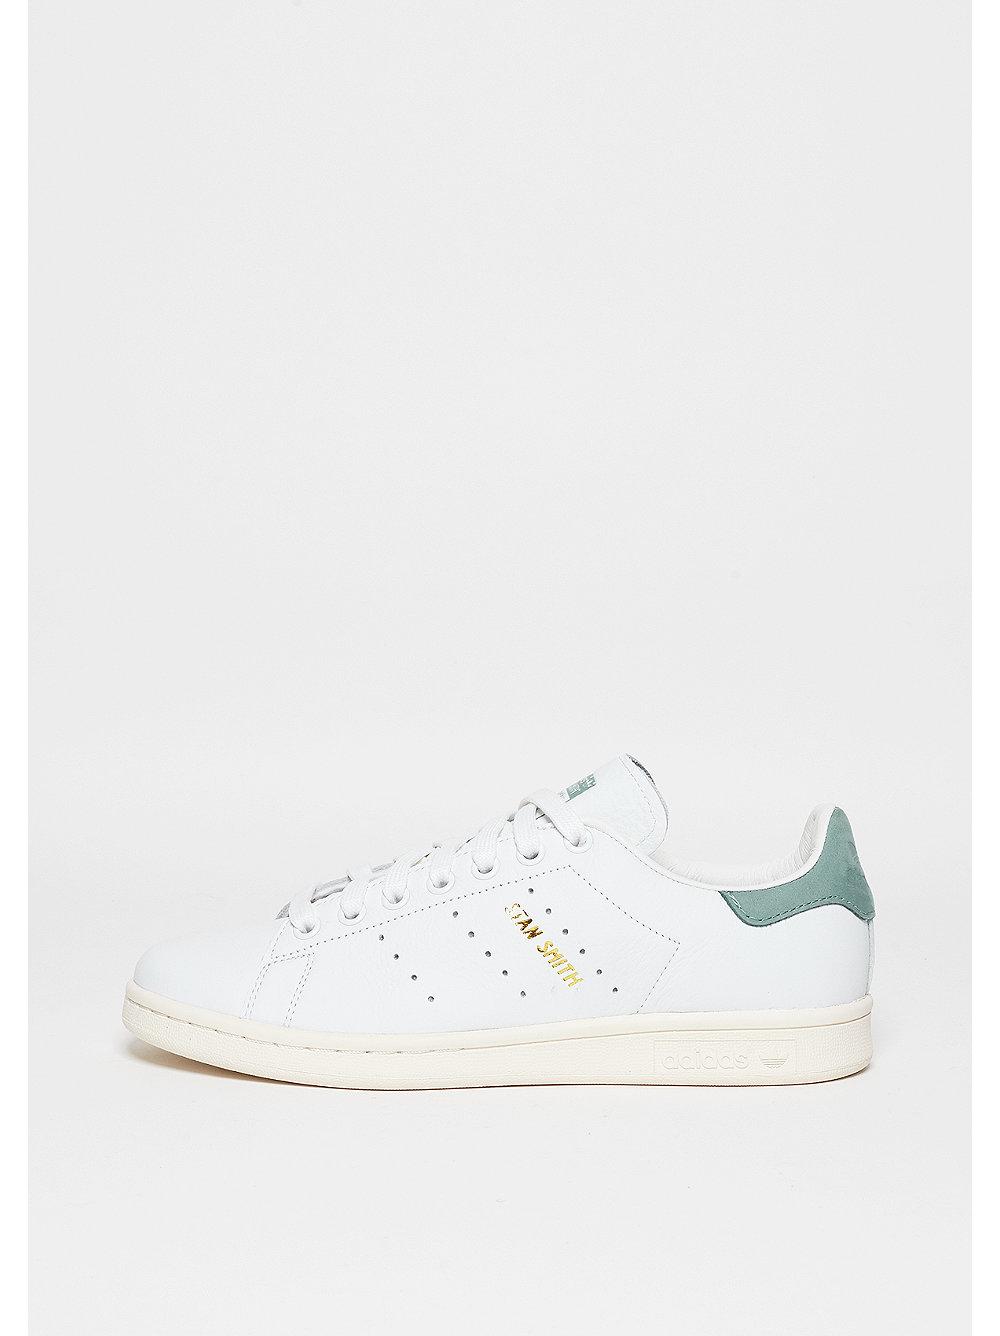 Adidas Stan Smith damessneaker wit